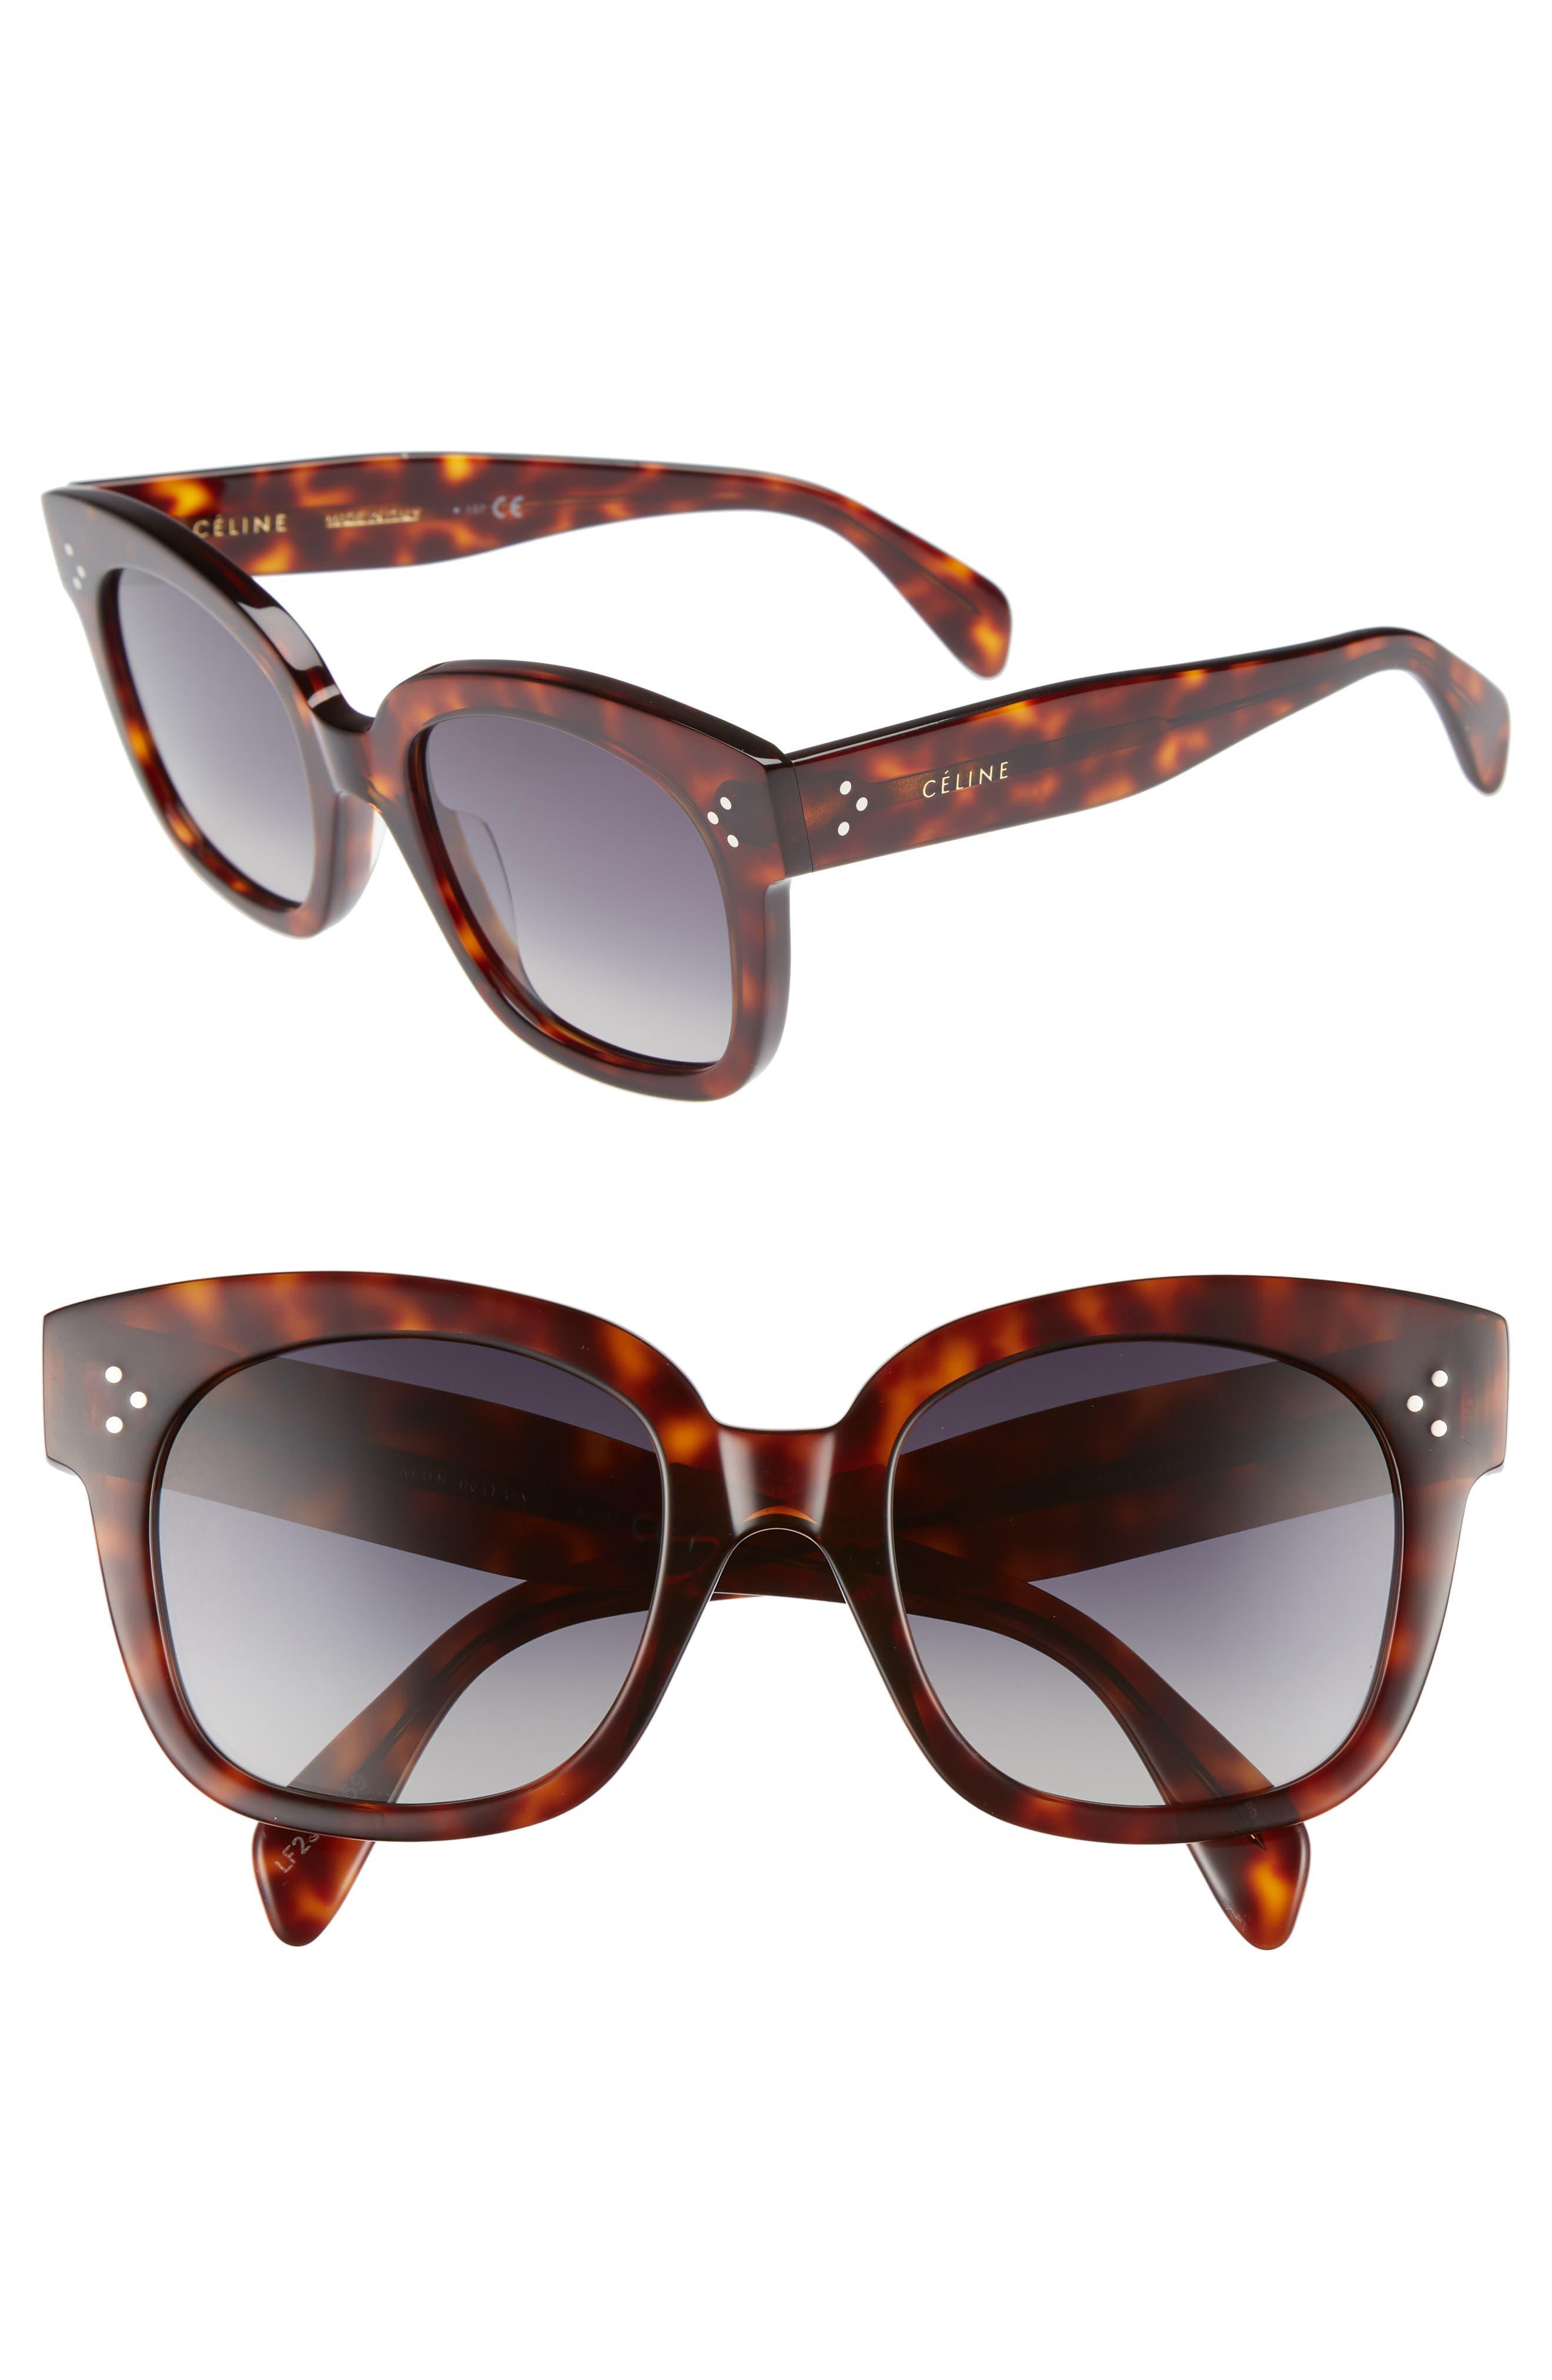 CELINE, 54mm Square Sunglasses, Main thumbnail 1, color, RED HAVAN/ SMOKE